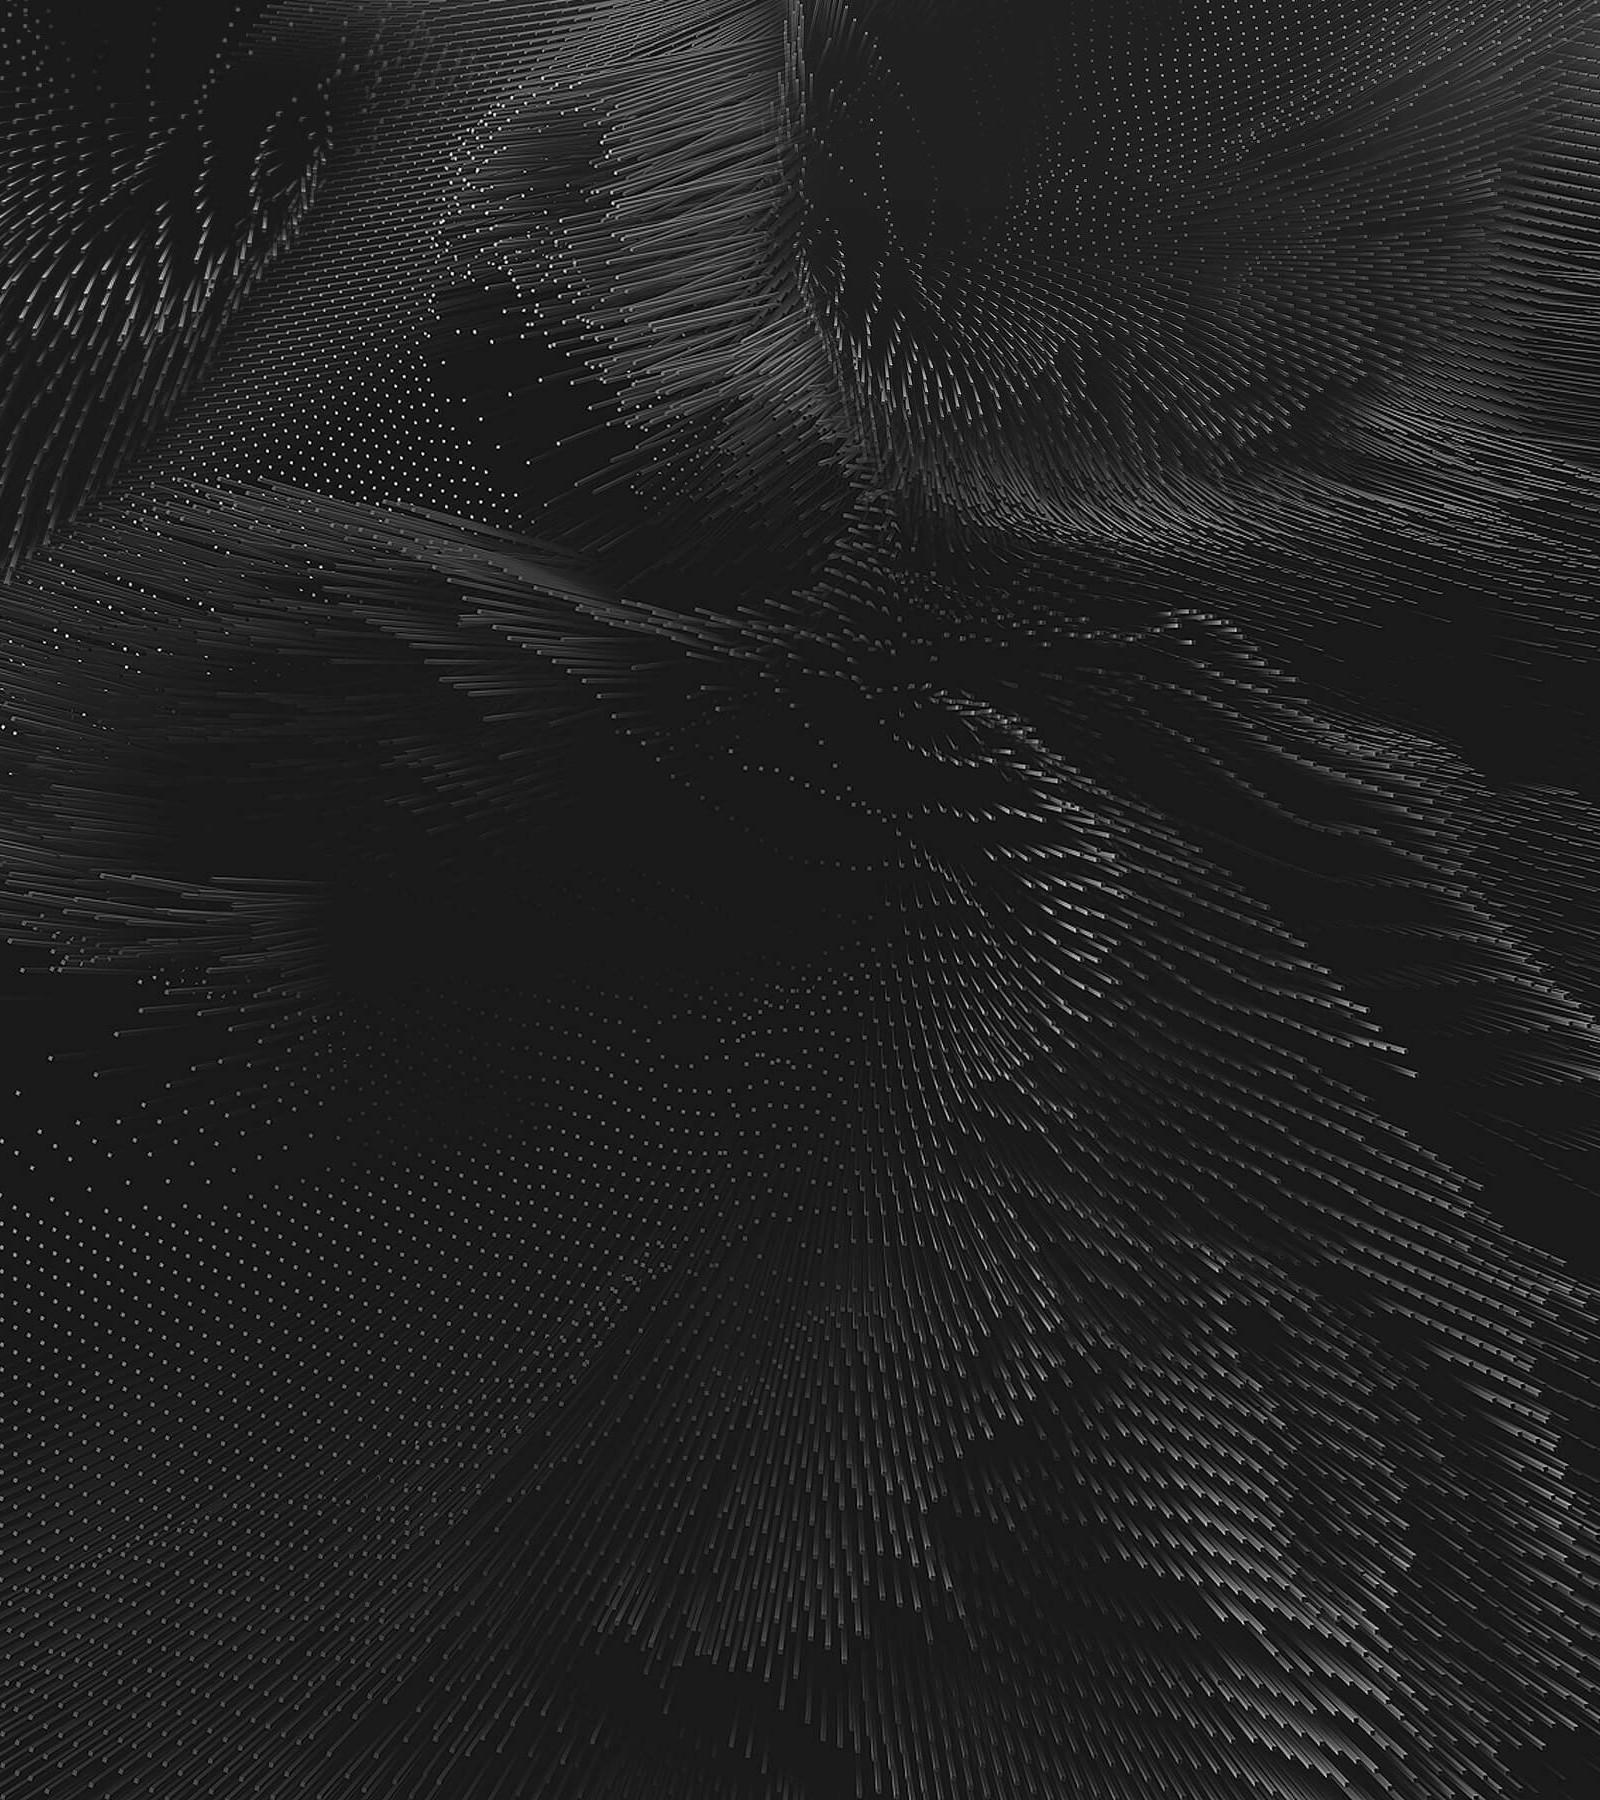 wind rendering hd wallpaper for kindle fire hdx 8 9